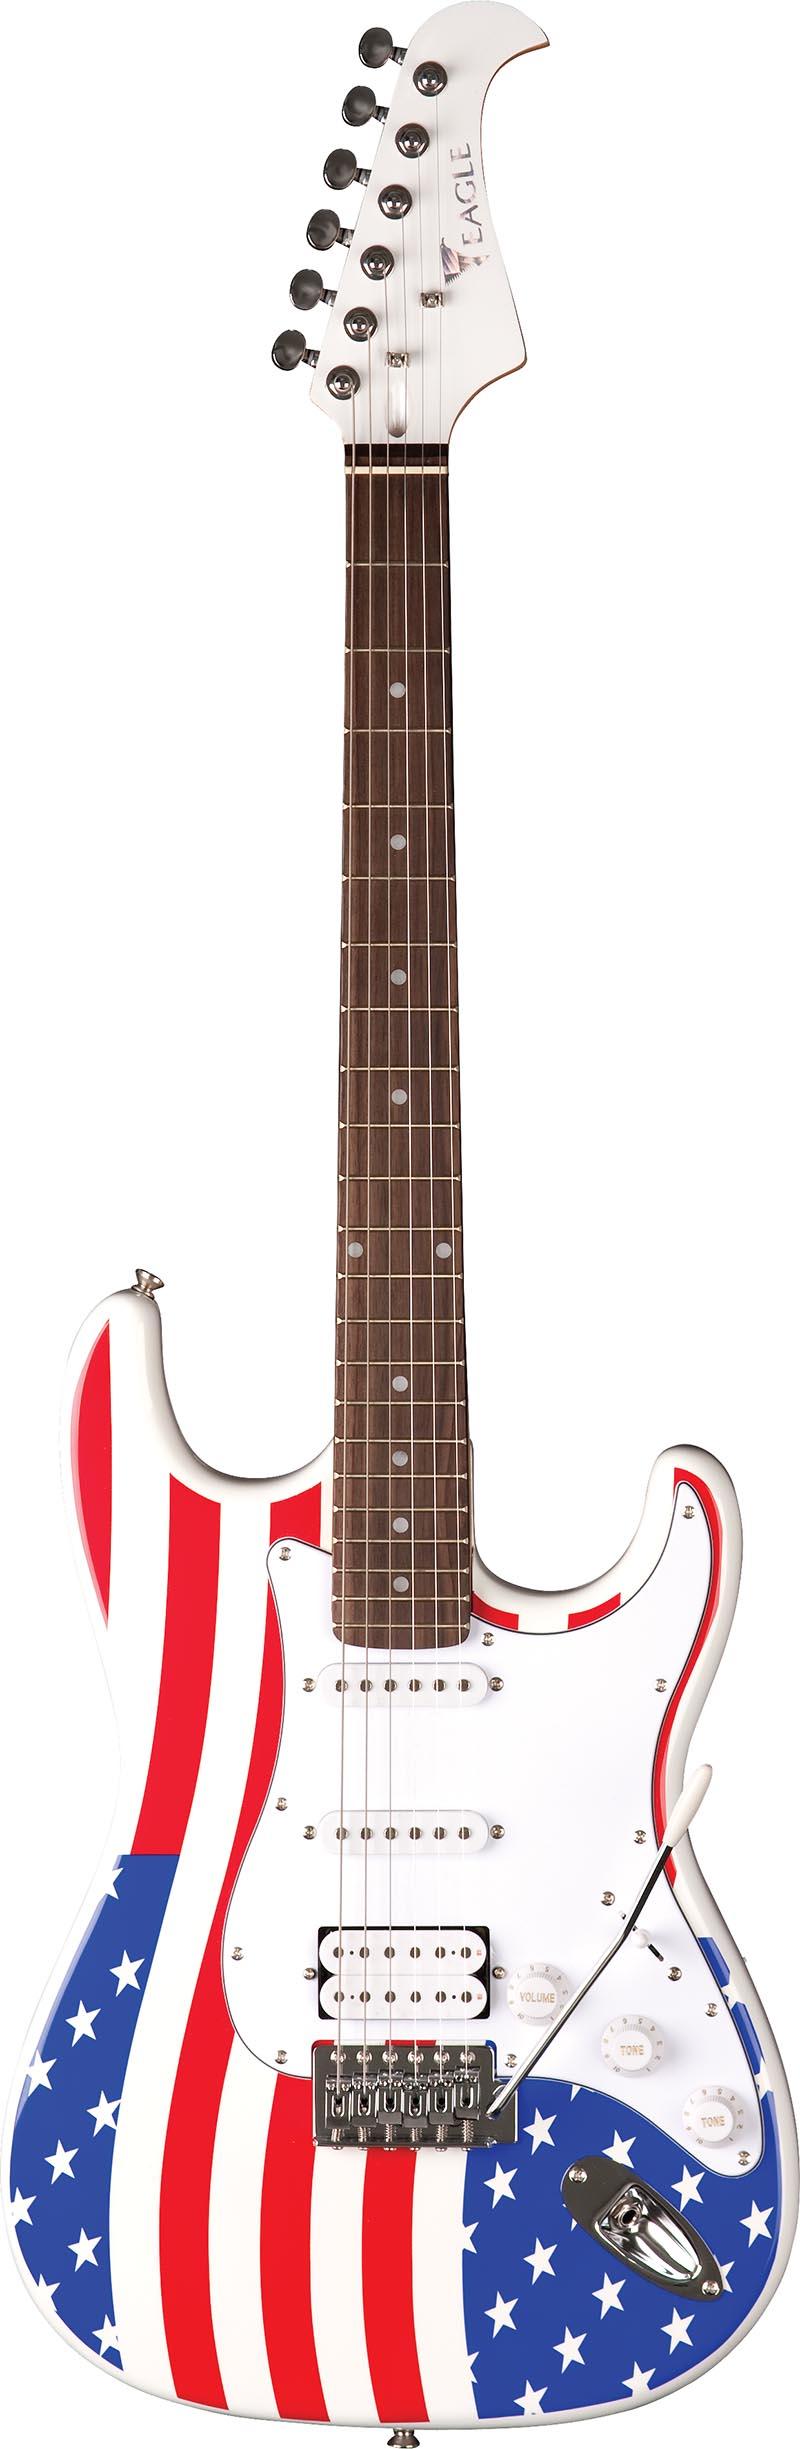 sts002 guitarra eletrica stratocaster captador humbucker eagle sts002 us bandeira americana visao frontal vertical